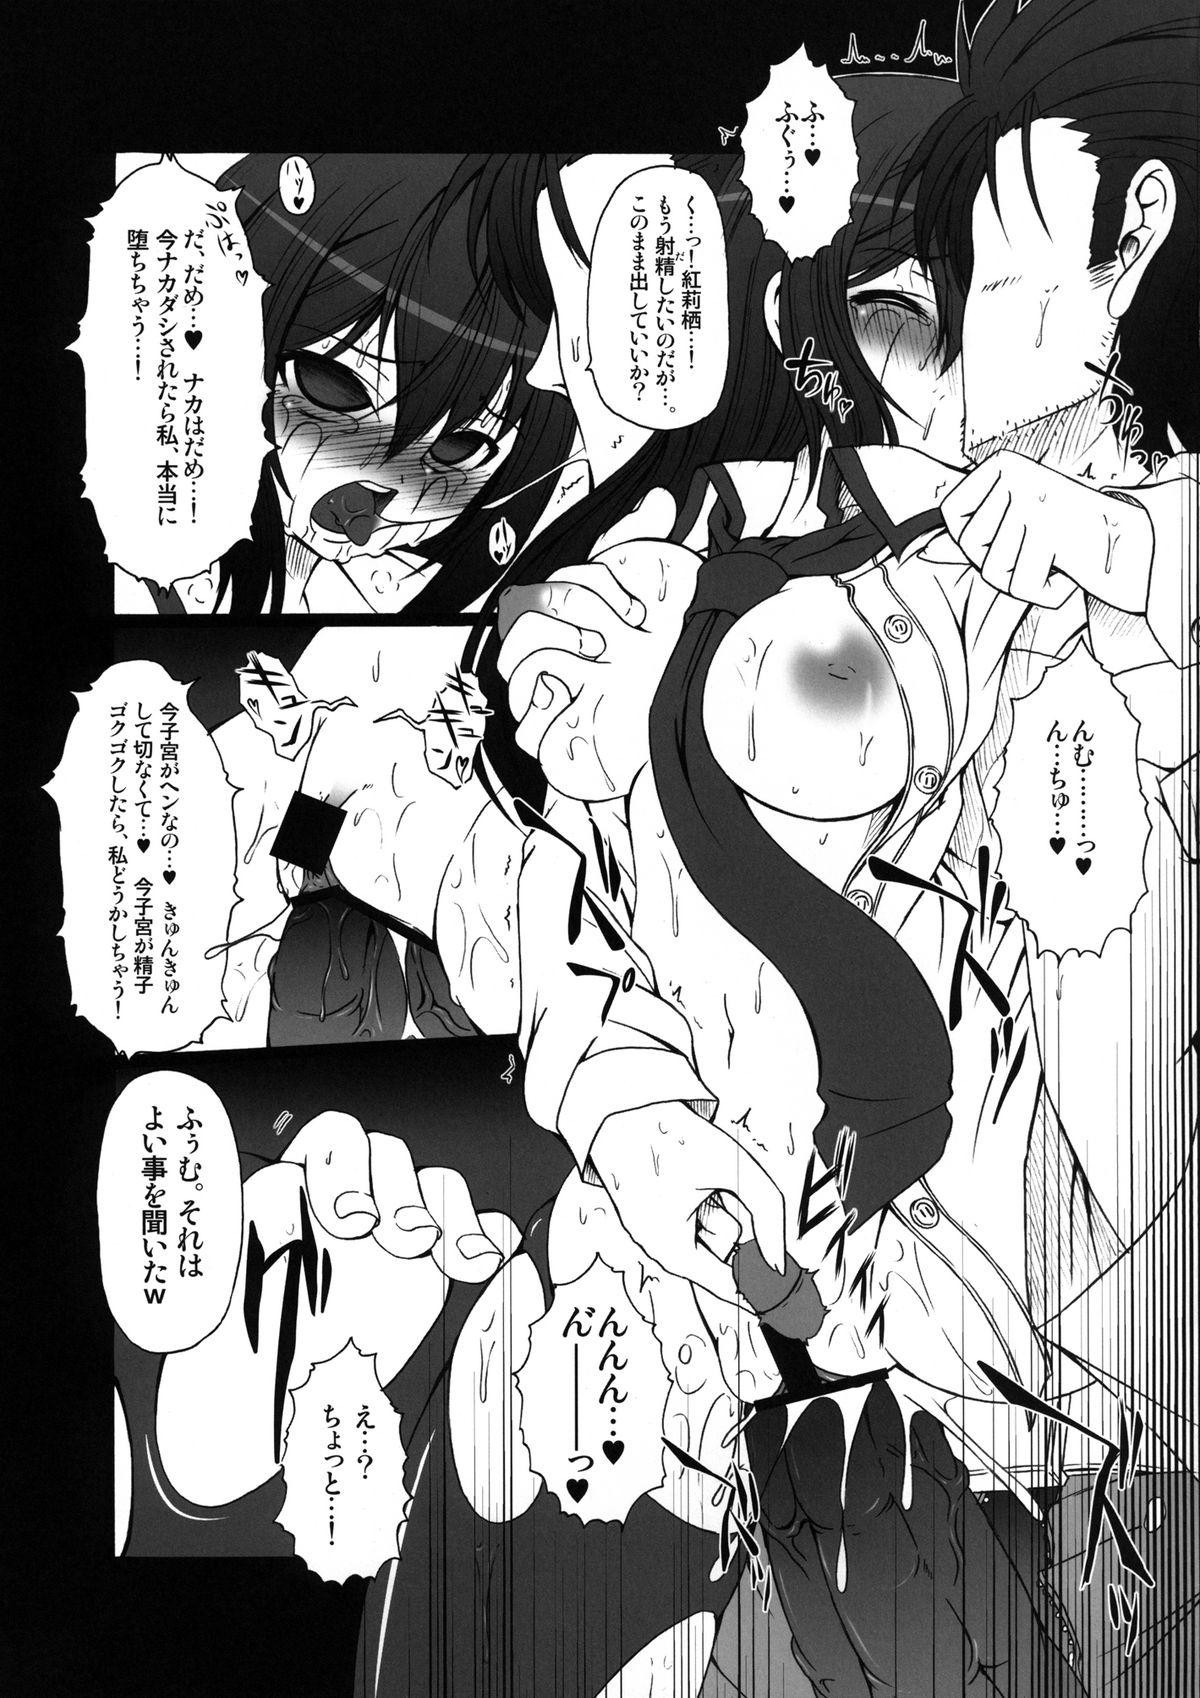 HOBBY'S BLOCK!! 14 Kairaku Tousaku no Ecstasy 26